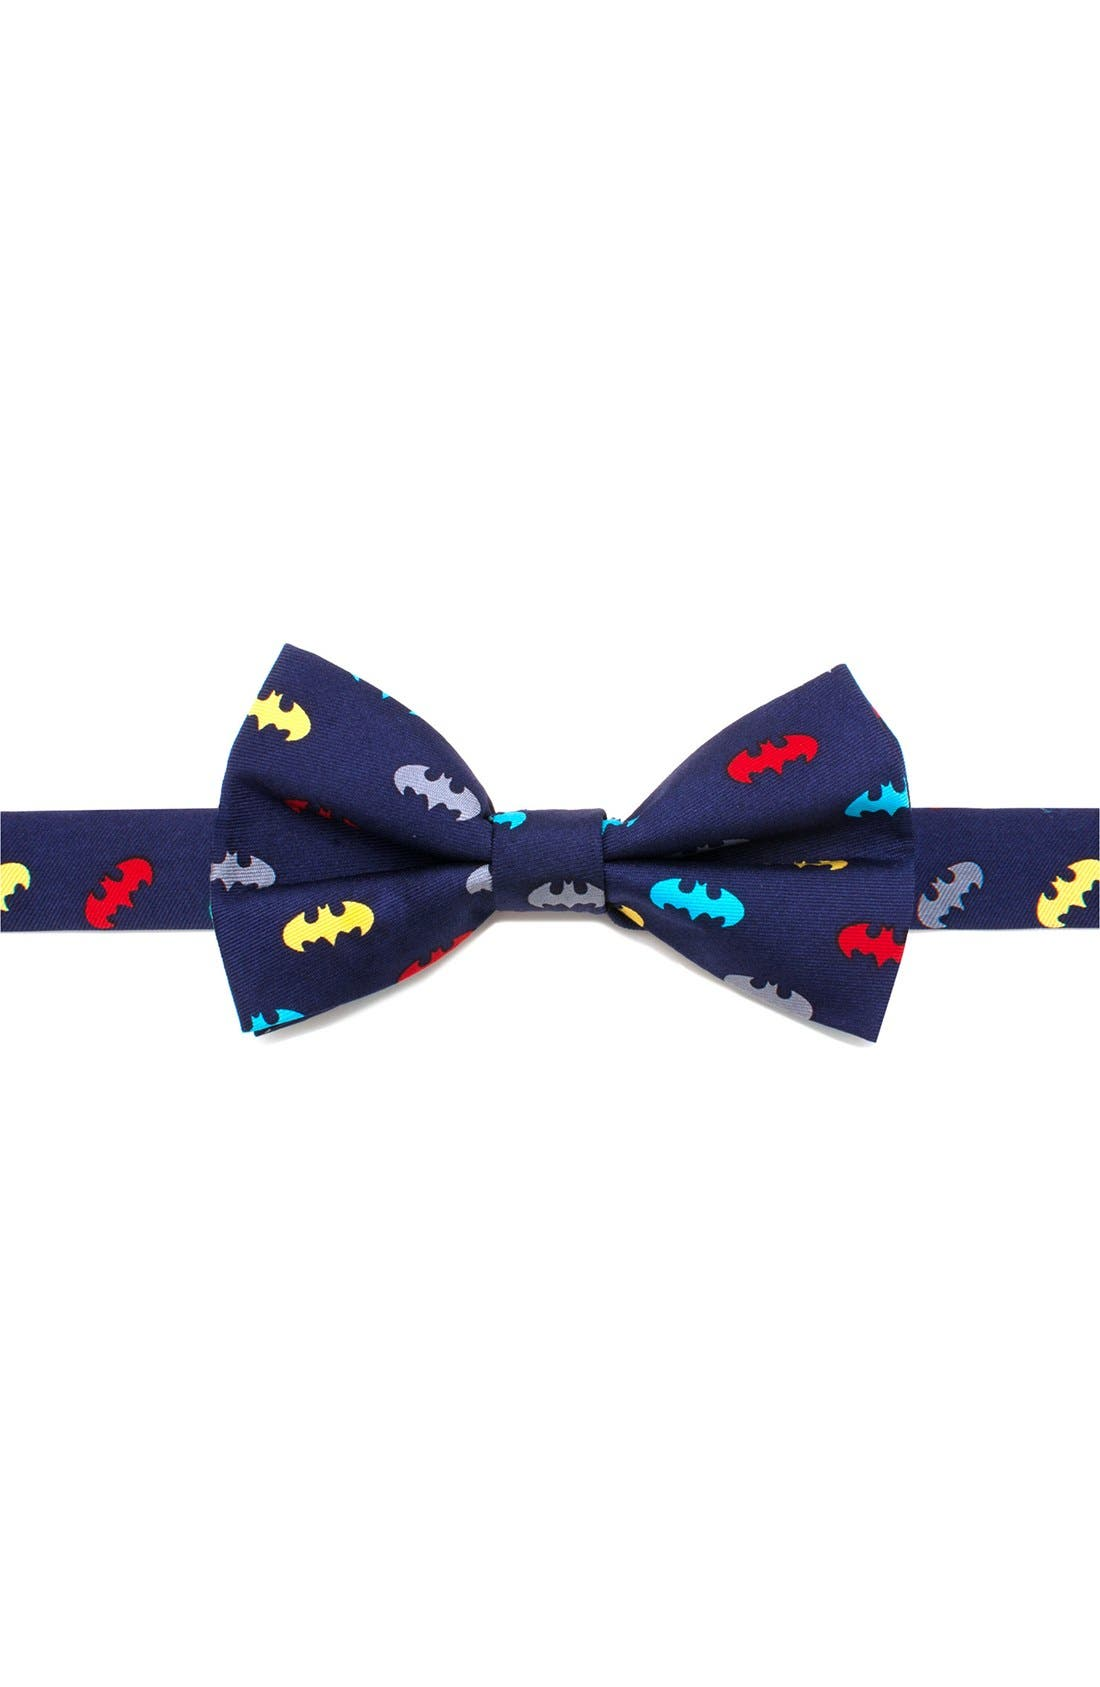 CUFFLINKS, INC. 'Batman' Silk Bow Tie